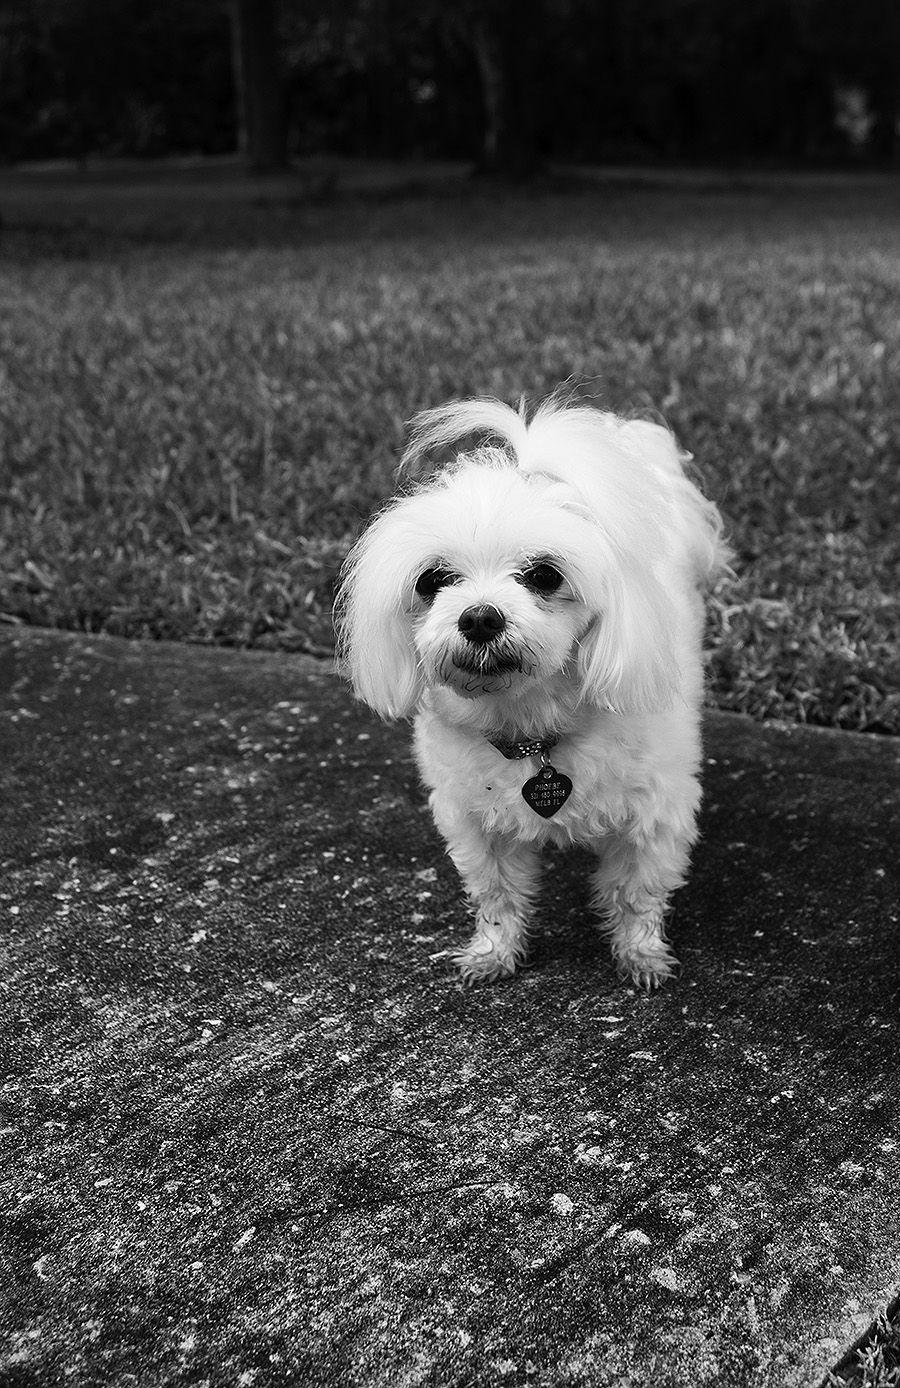 Anni_Liu_Photography_Individual_Project_8_Home_Dog_Phoebe_Liu